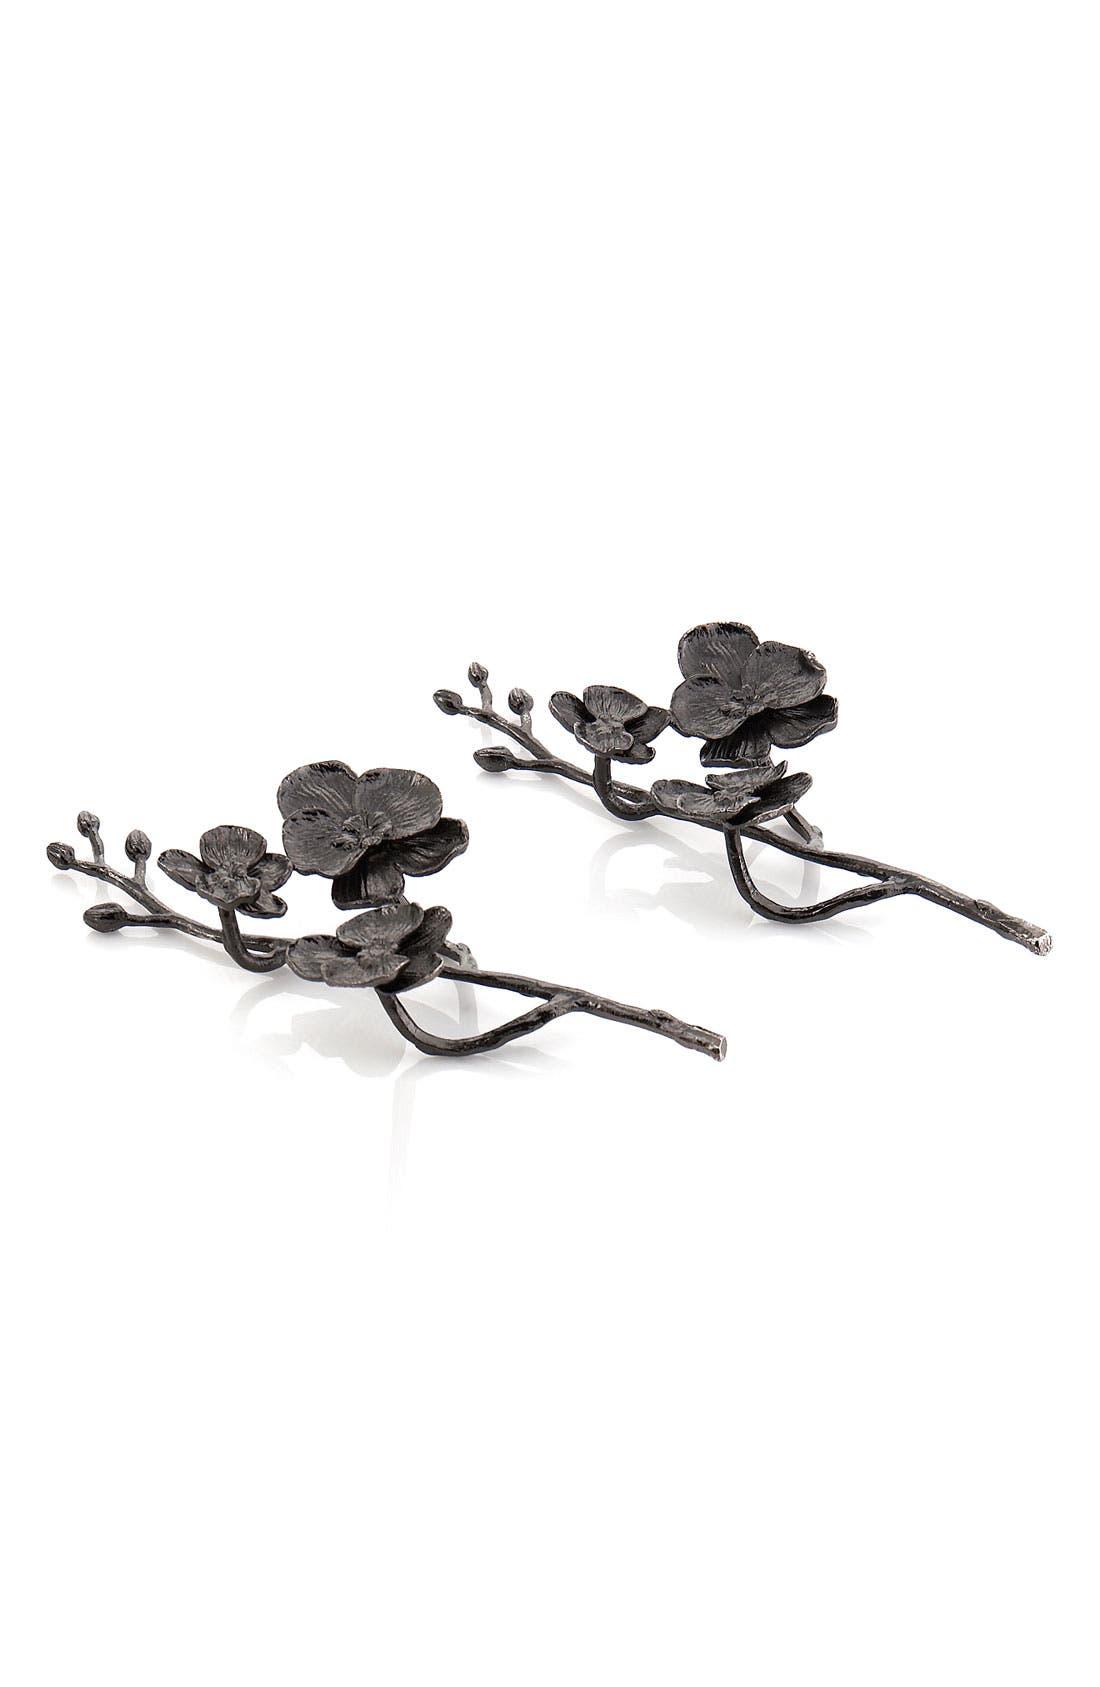 Alternate Image 1 Selected - Michael Aram 'Black Orchid' Napkin Rings (Set of 2)